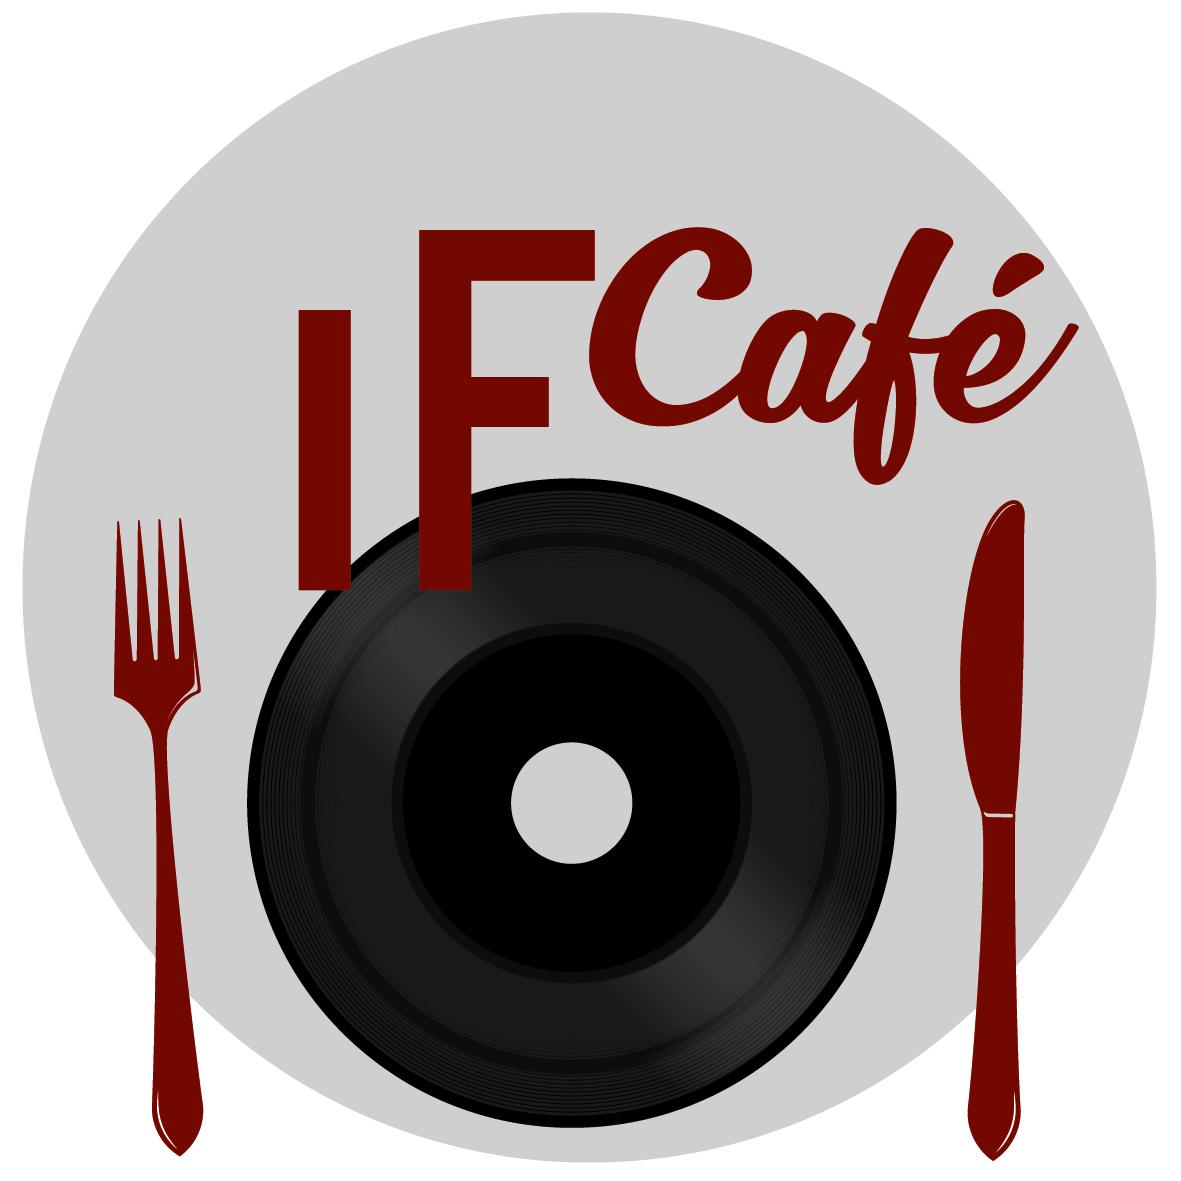 Logotype IFcafé